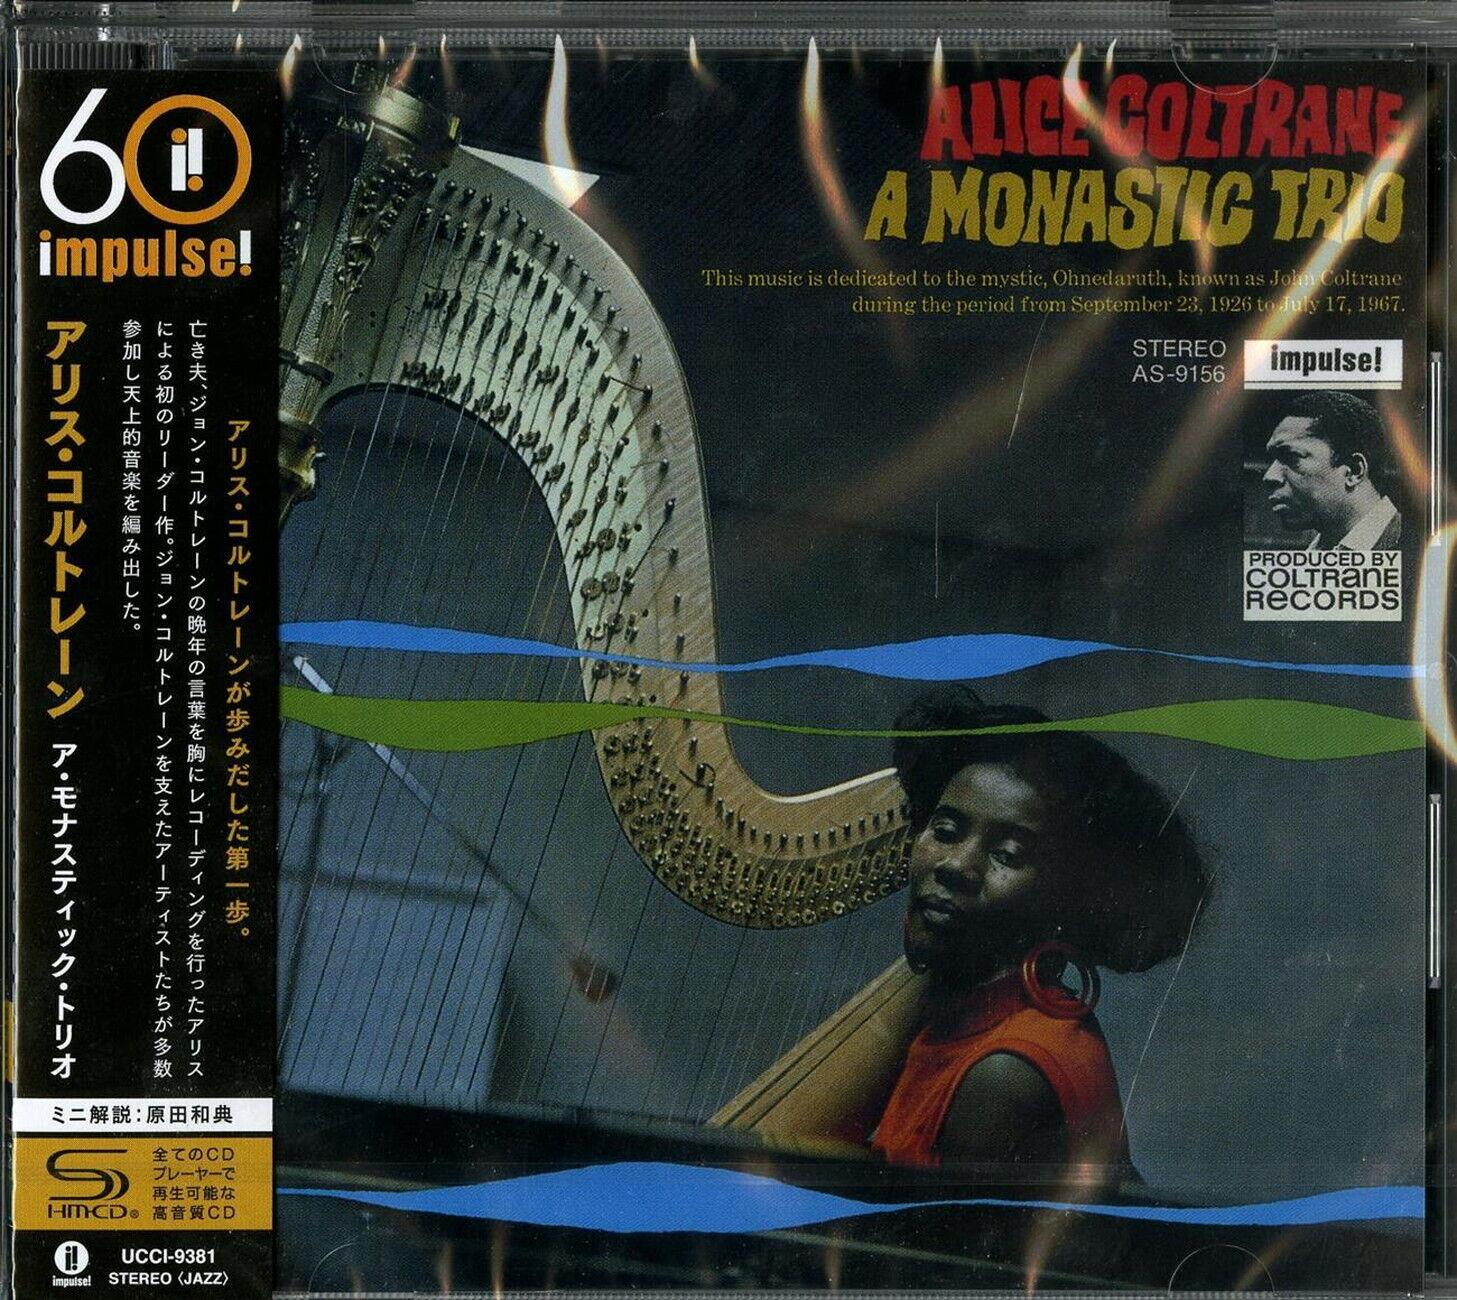 Image 1 - ALICE COLTRANE-A MONASTIC TRIO-JAPAN SHM-CD Ltd/Ed C94